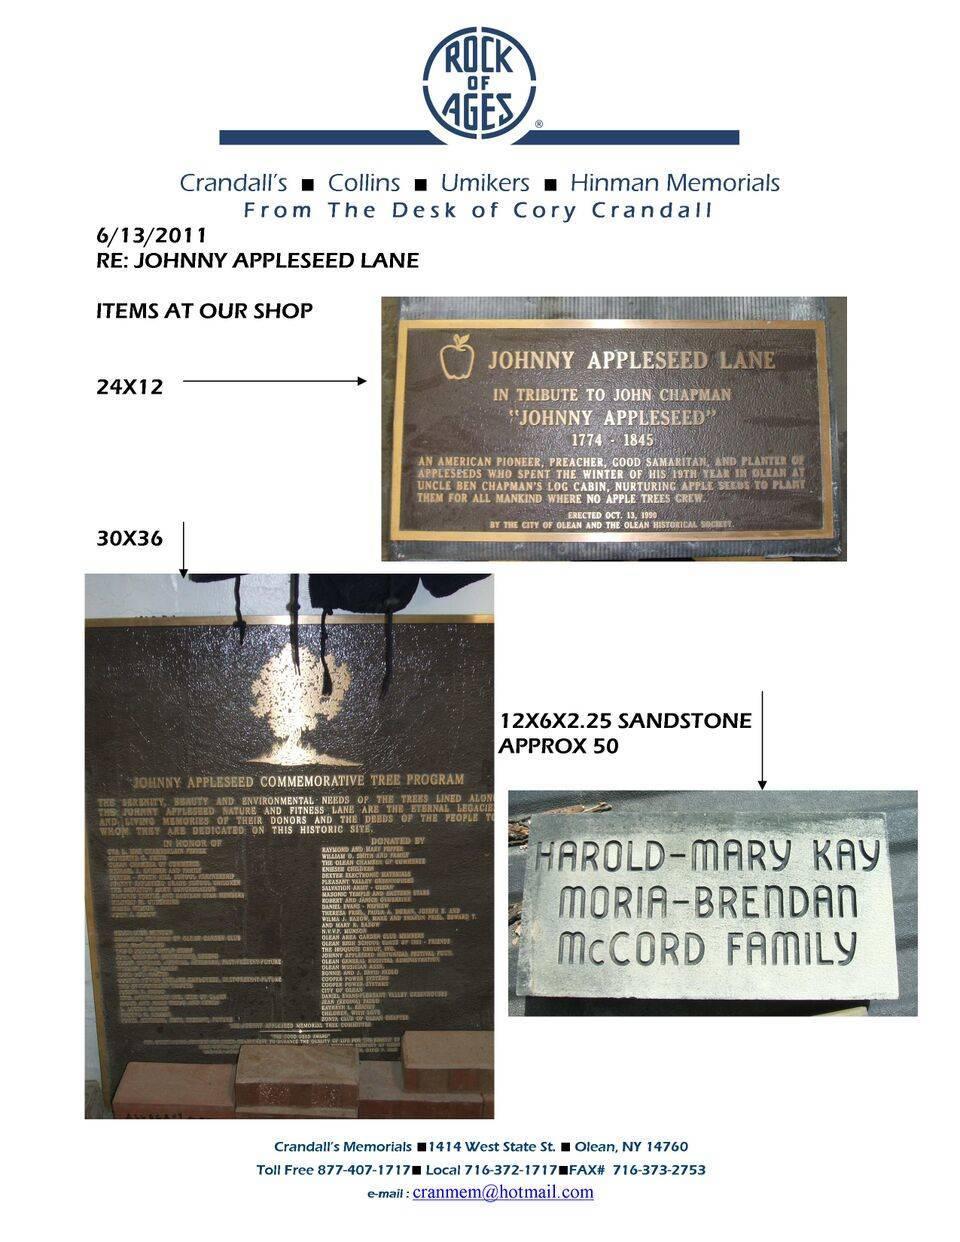 892acfa76bff33b66d6d_Johnny_Appleseed_Lane_Project.jpg